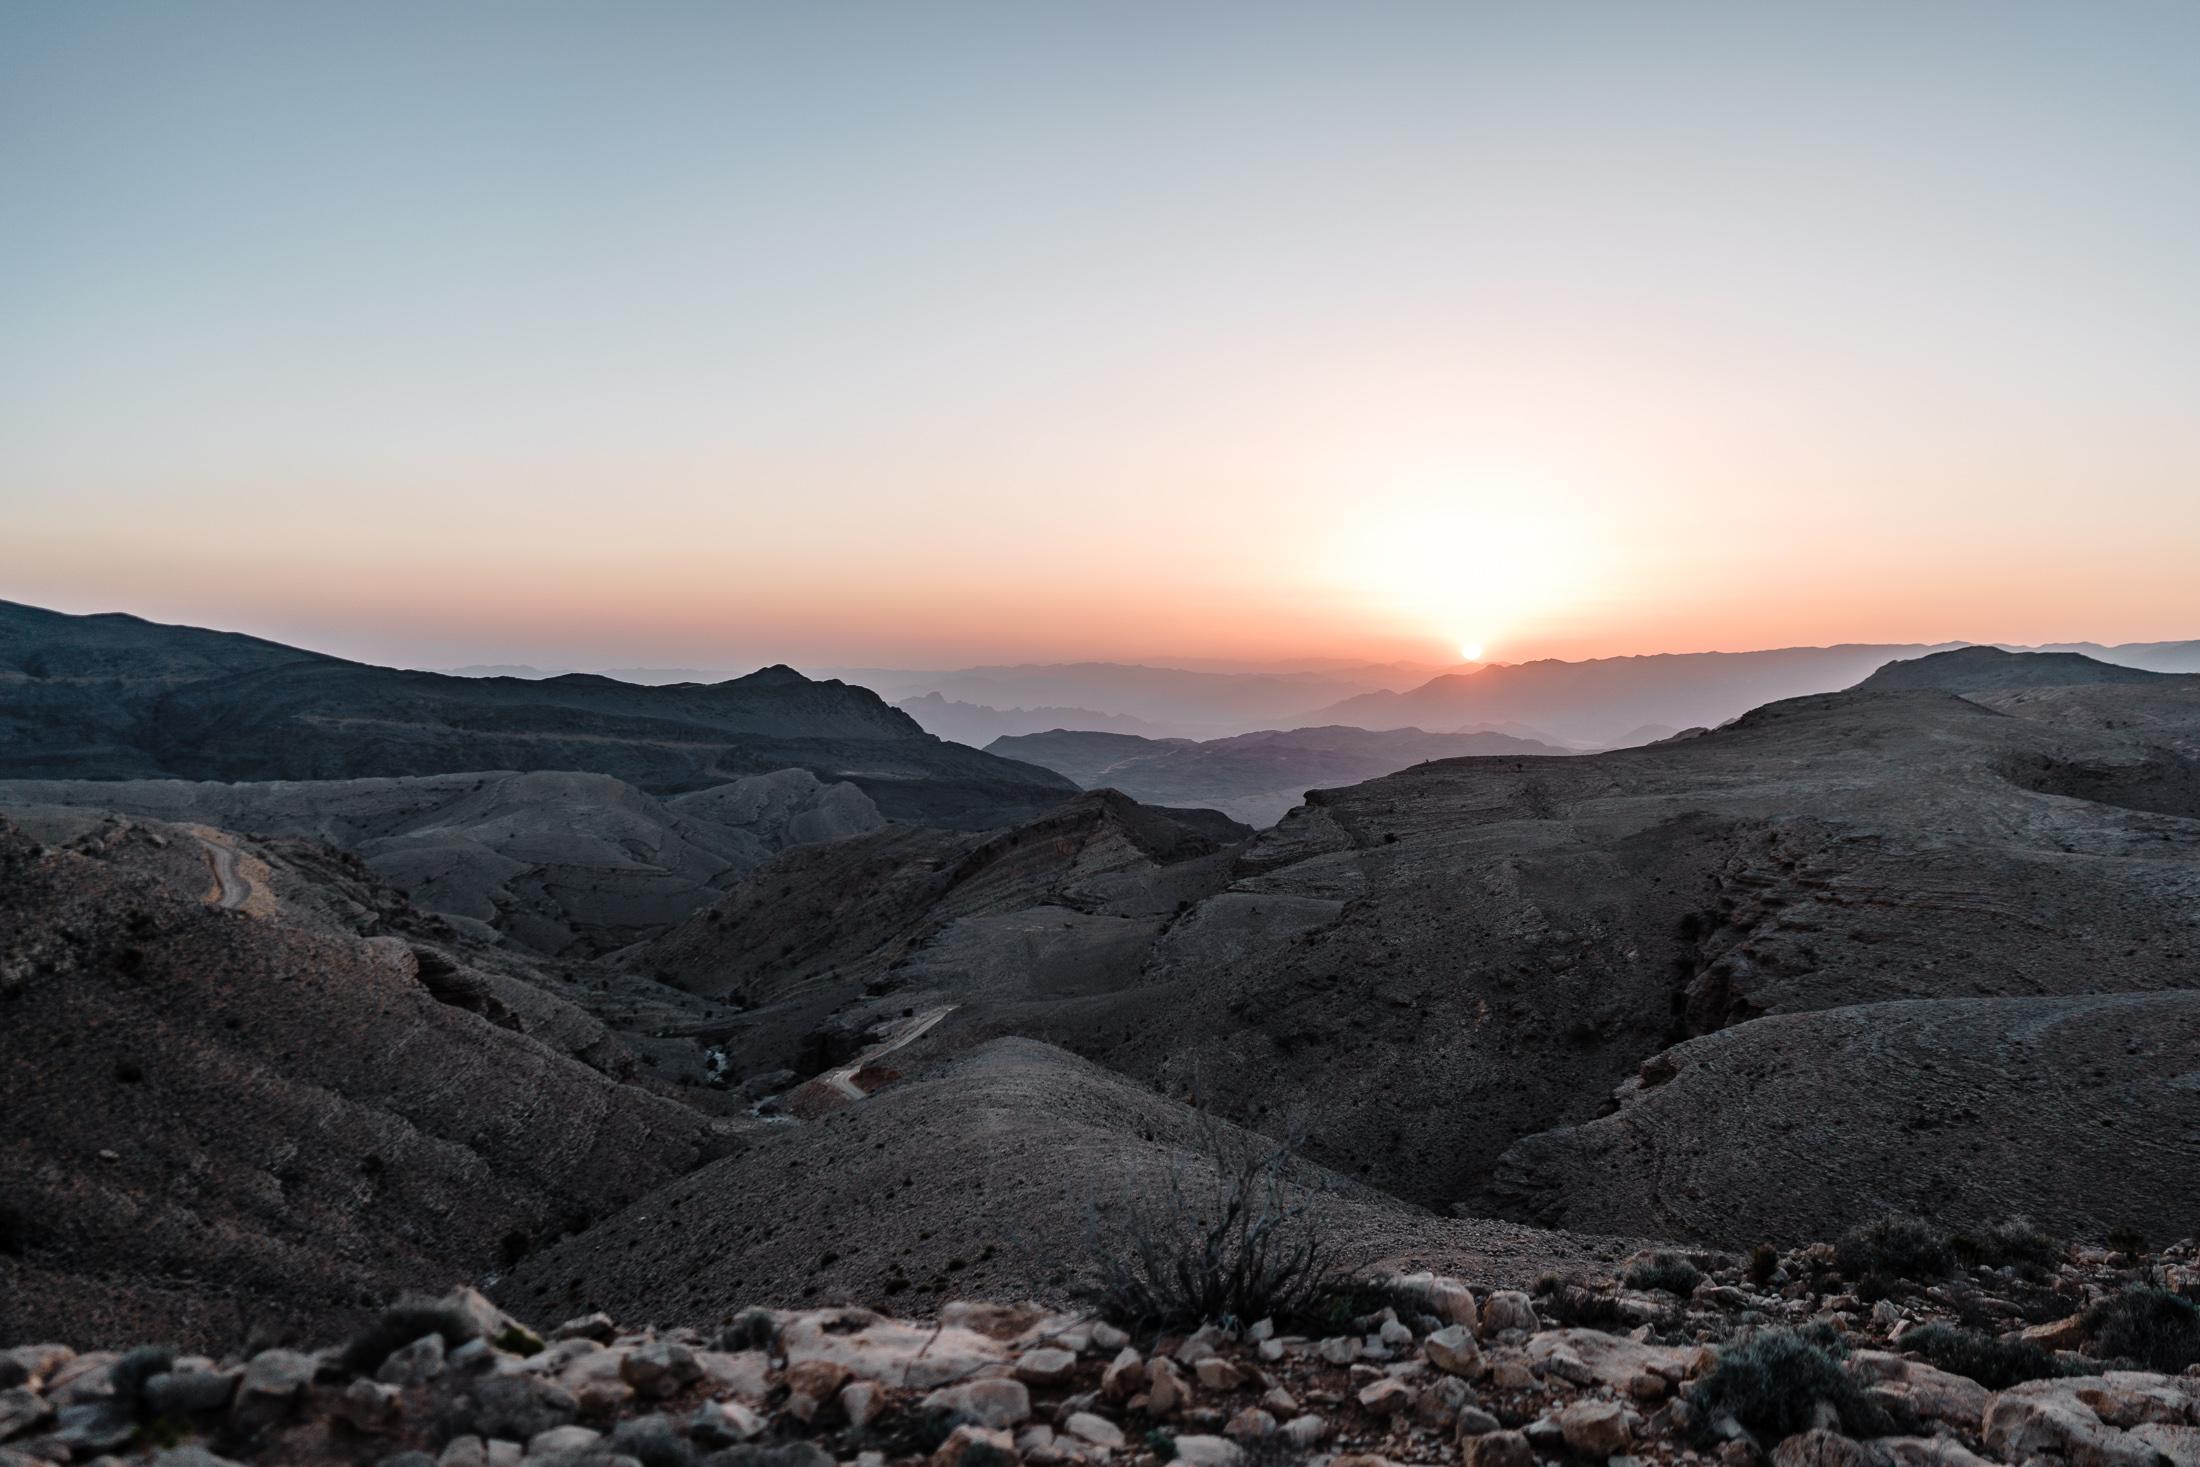 2019.05.01_Oman Solo_7860_2200px.jpg